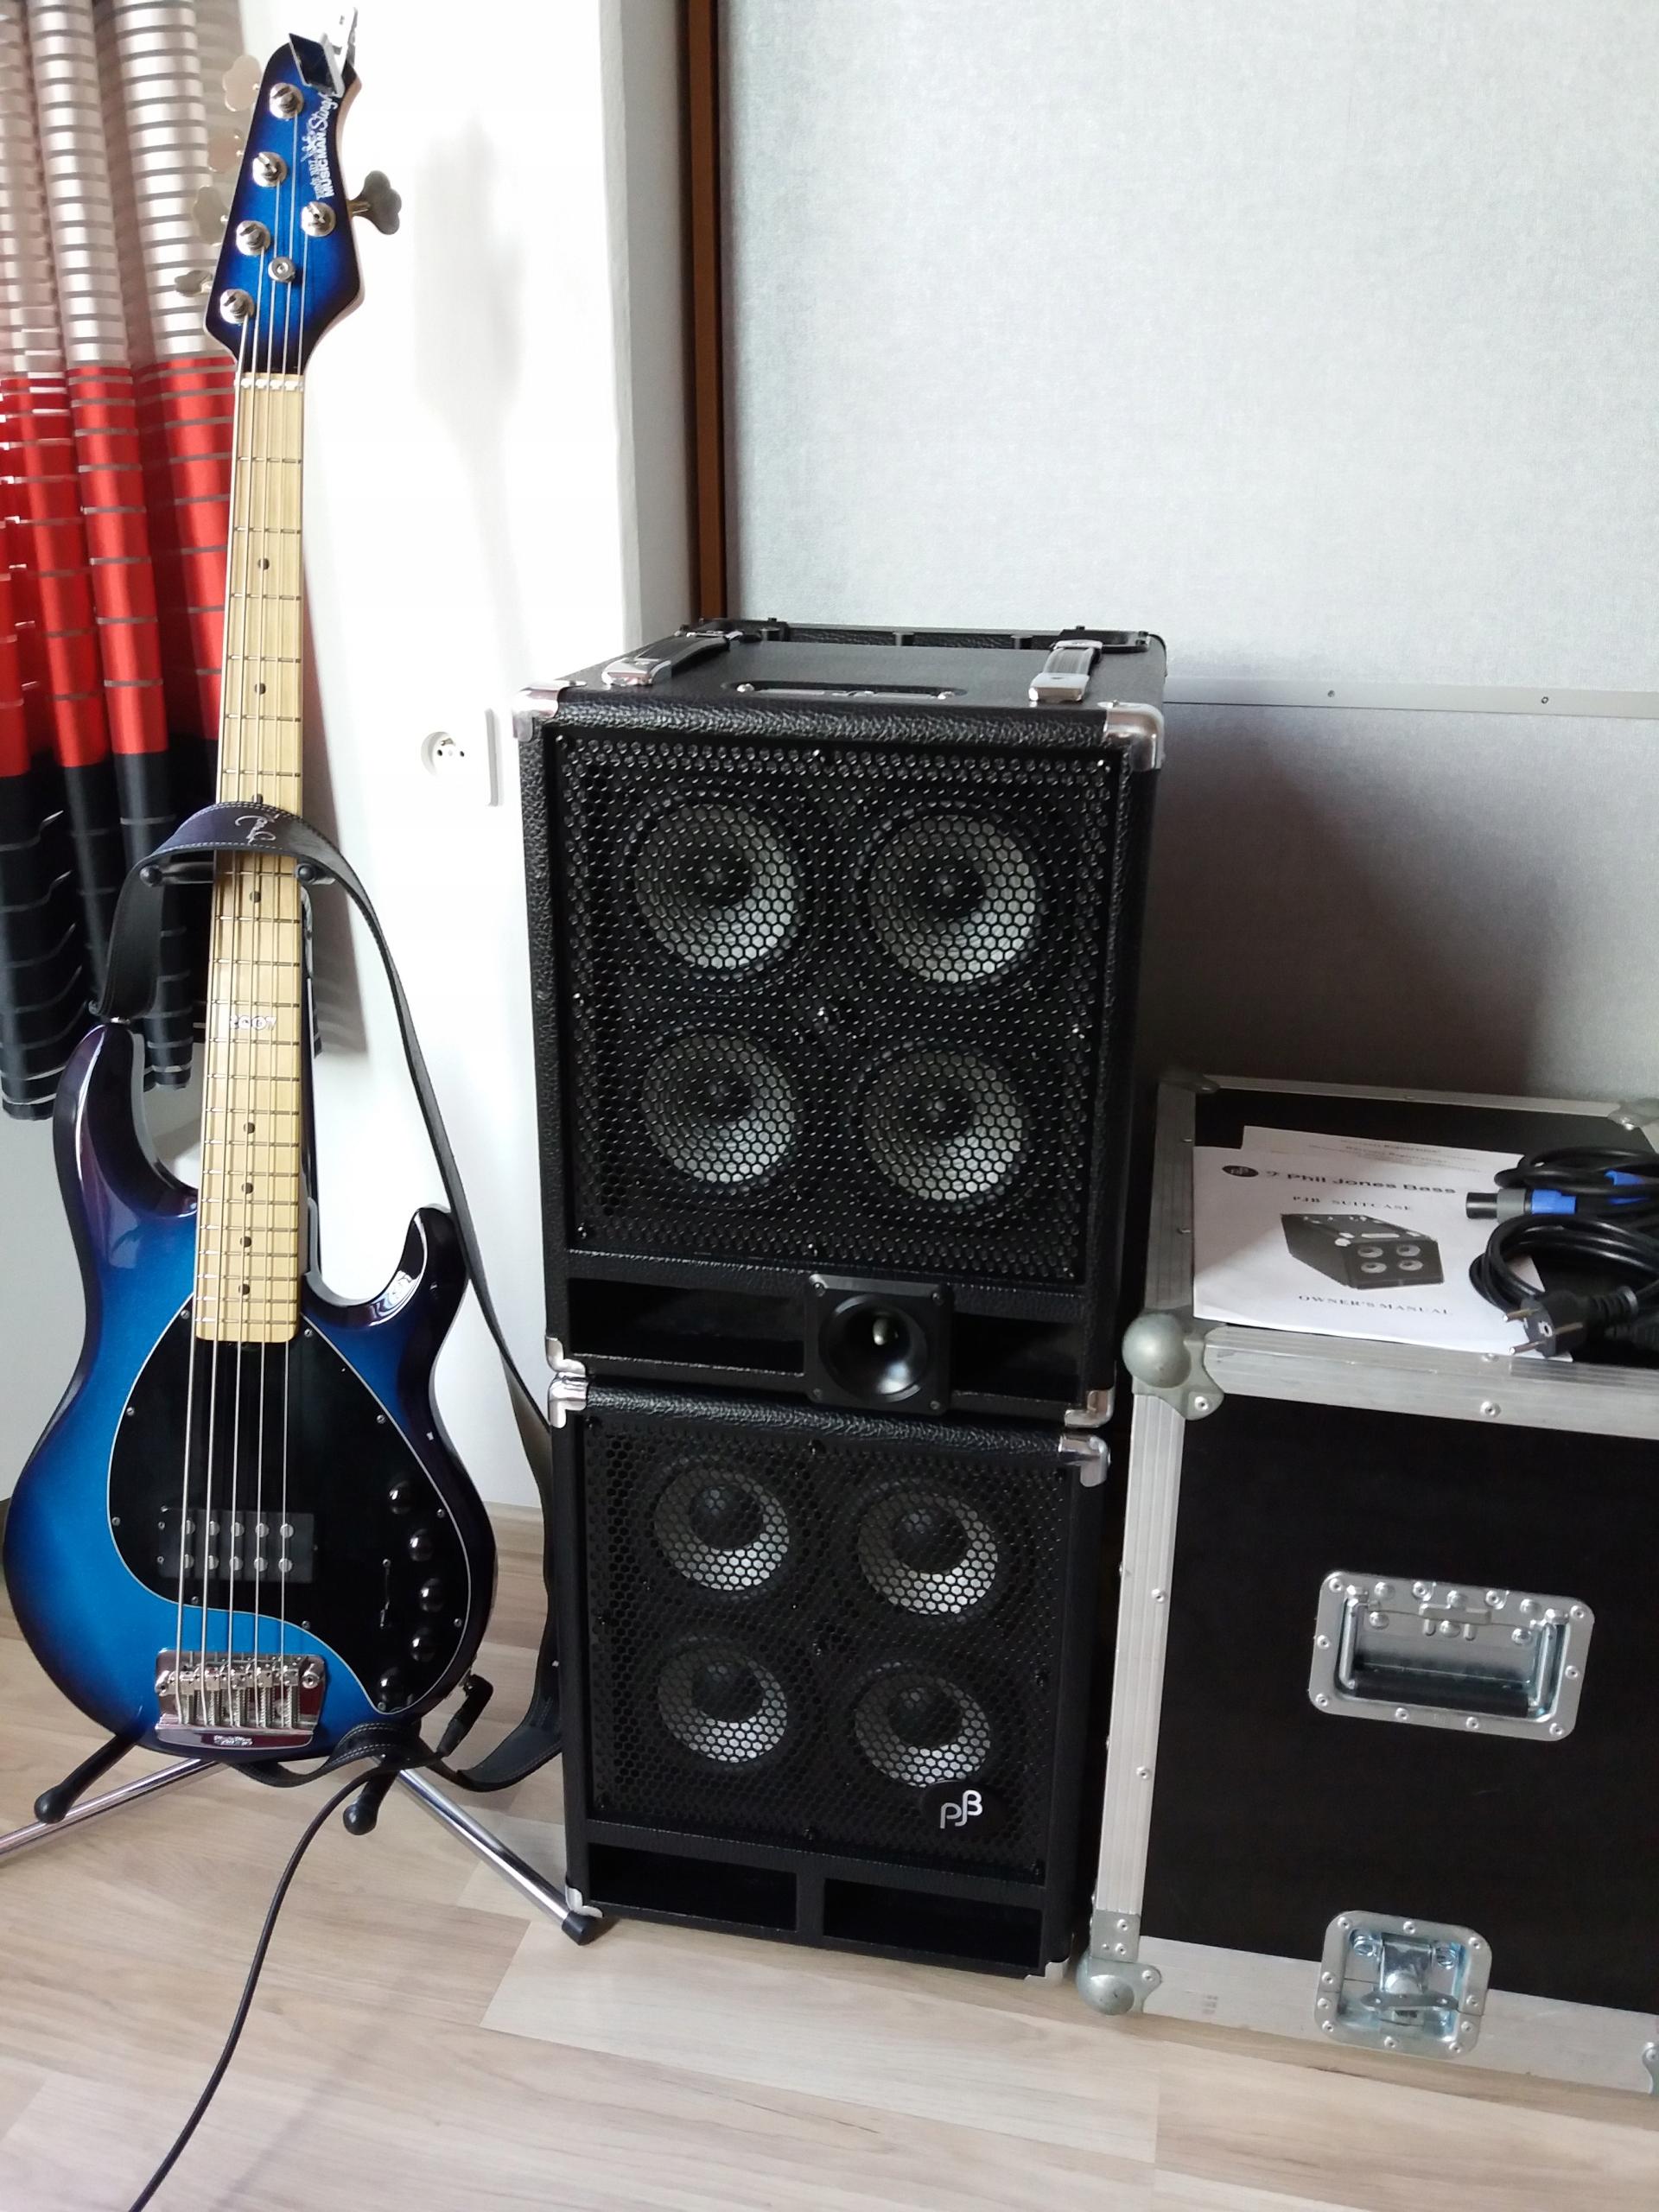 Phil Jones Bass Zestaw basowy 300 W Combo+kolumna